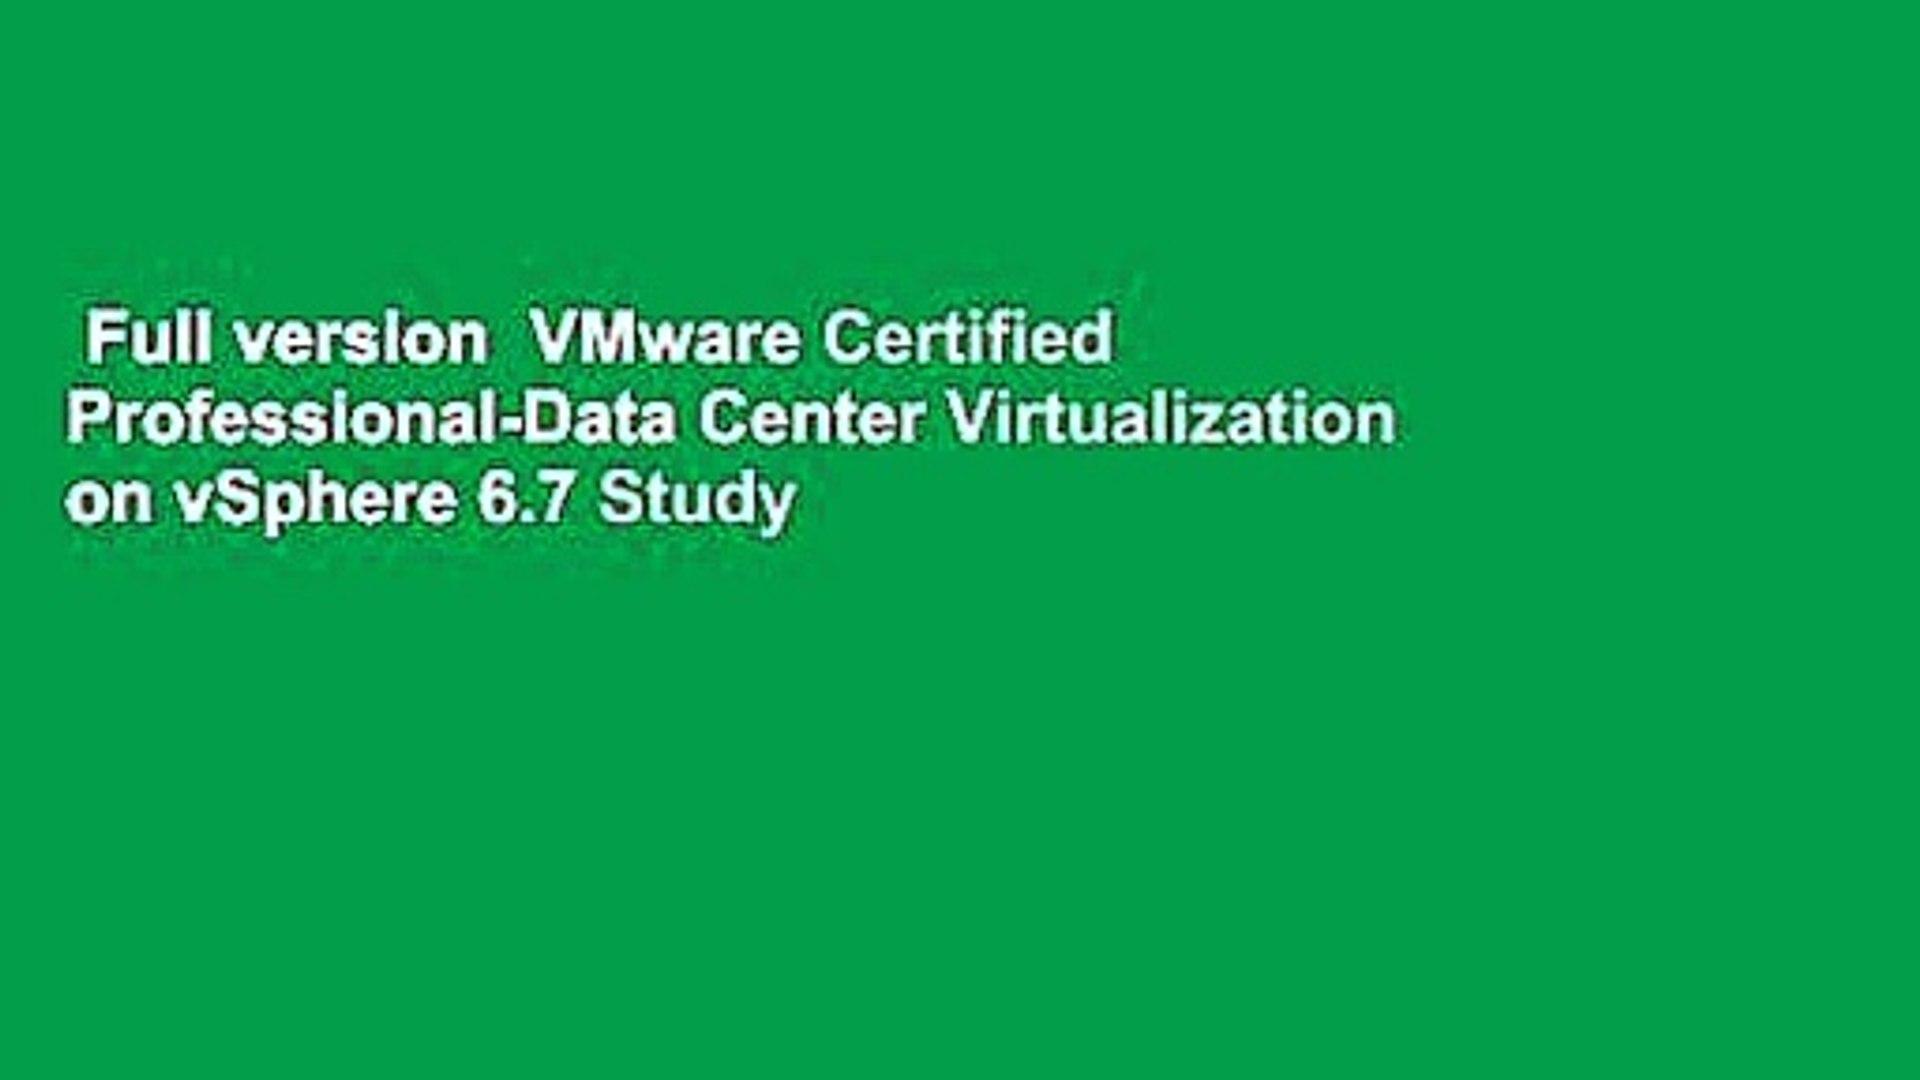 Full version  VMware Certified Professional-Data Center Virtualization on vSphere 6.7 Study